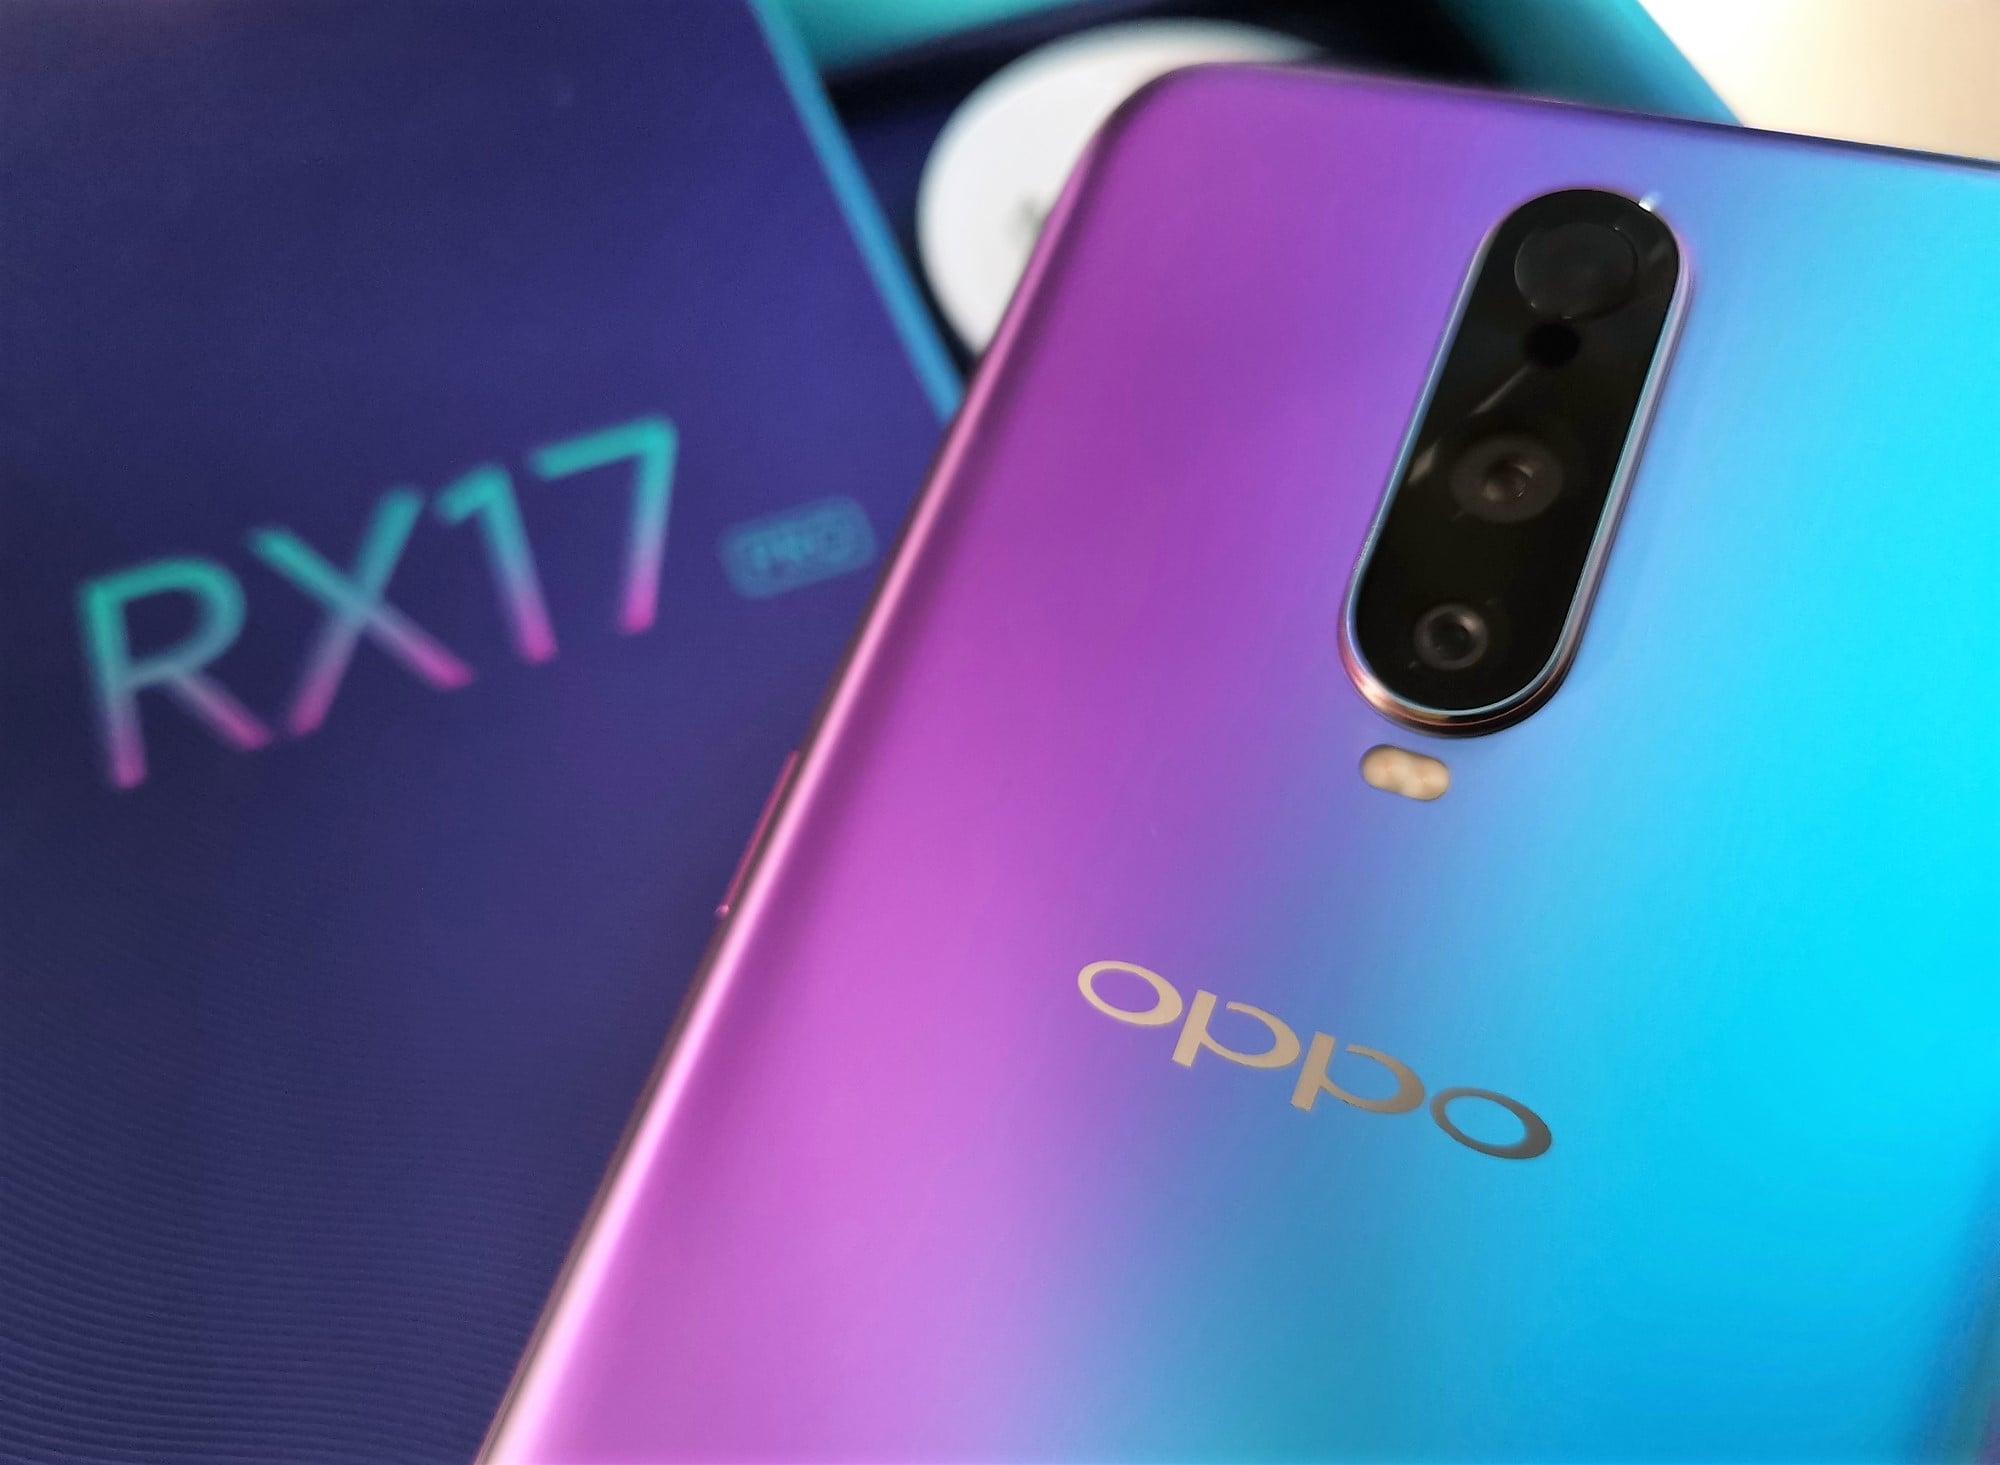 smartfon Oppo RX17 Pro